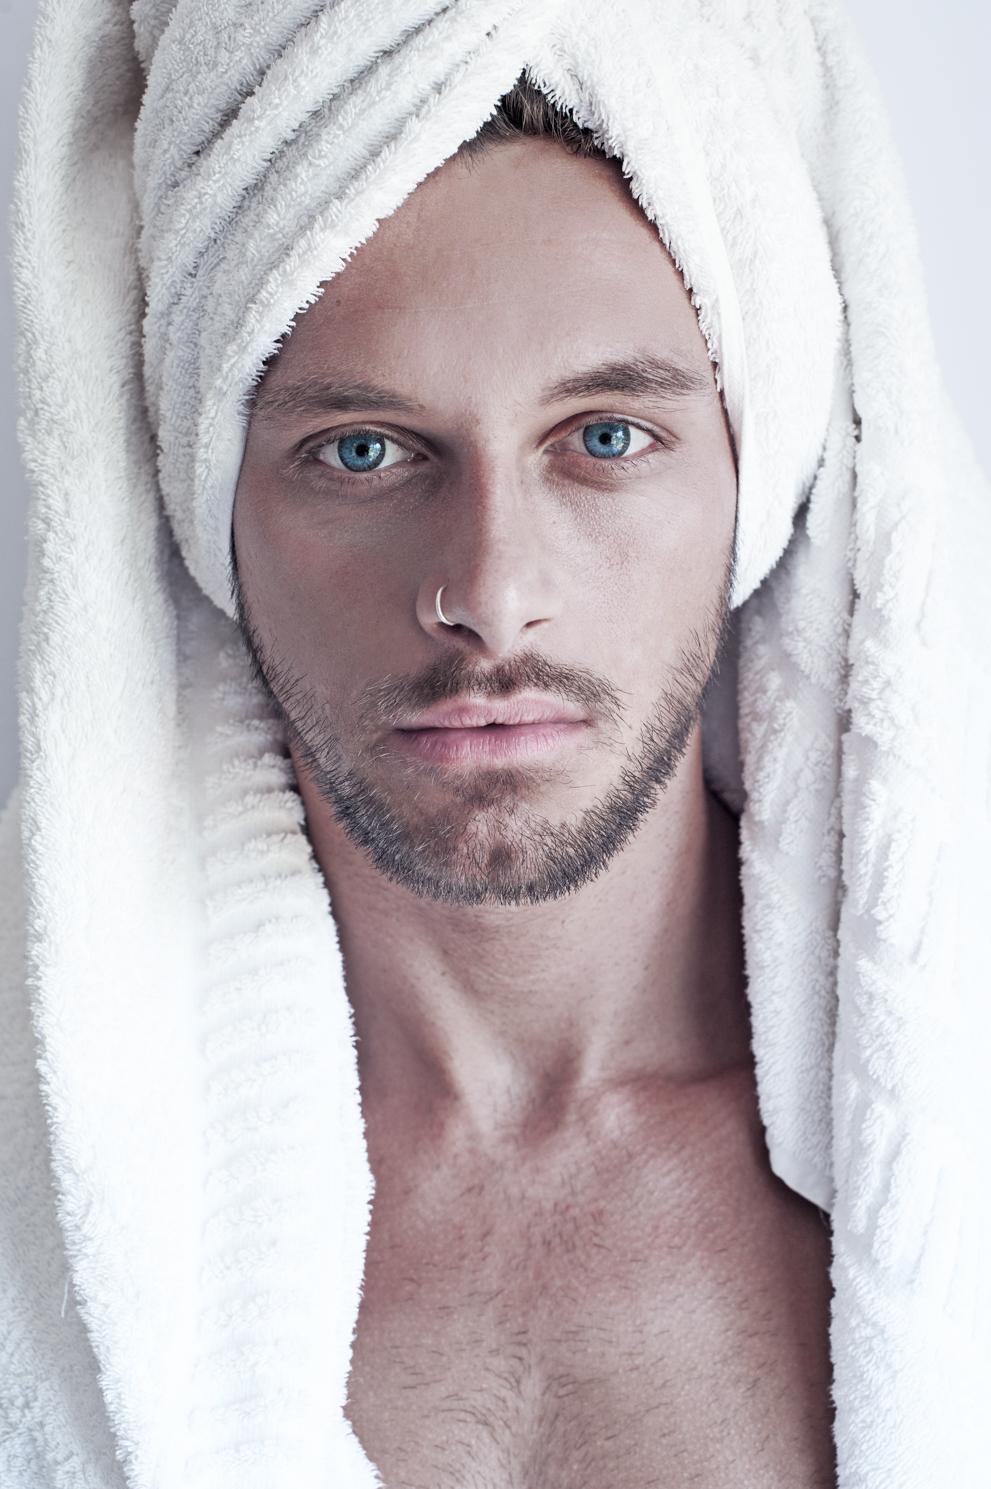 Blue eyes. Fine art photography by Farnham, Surrey based portrait and fashion photographer James Muller